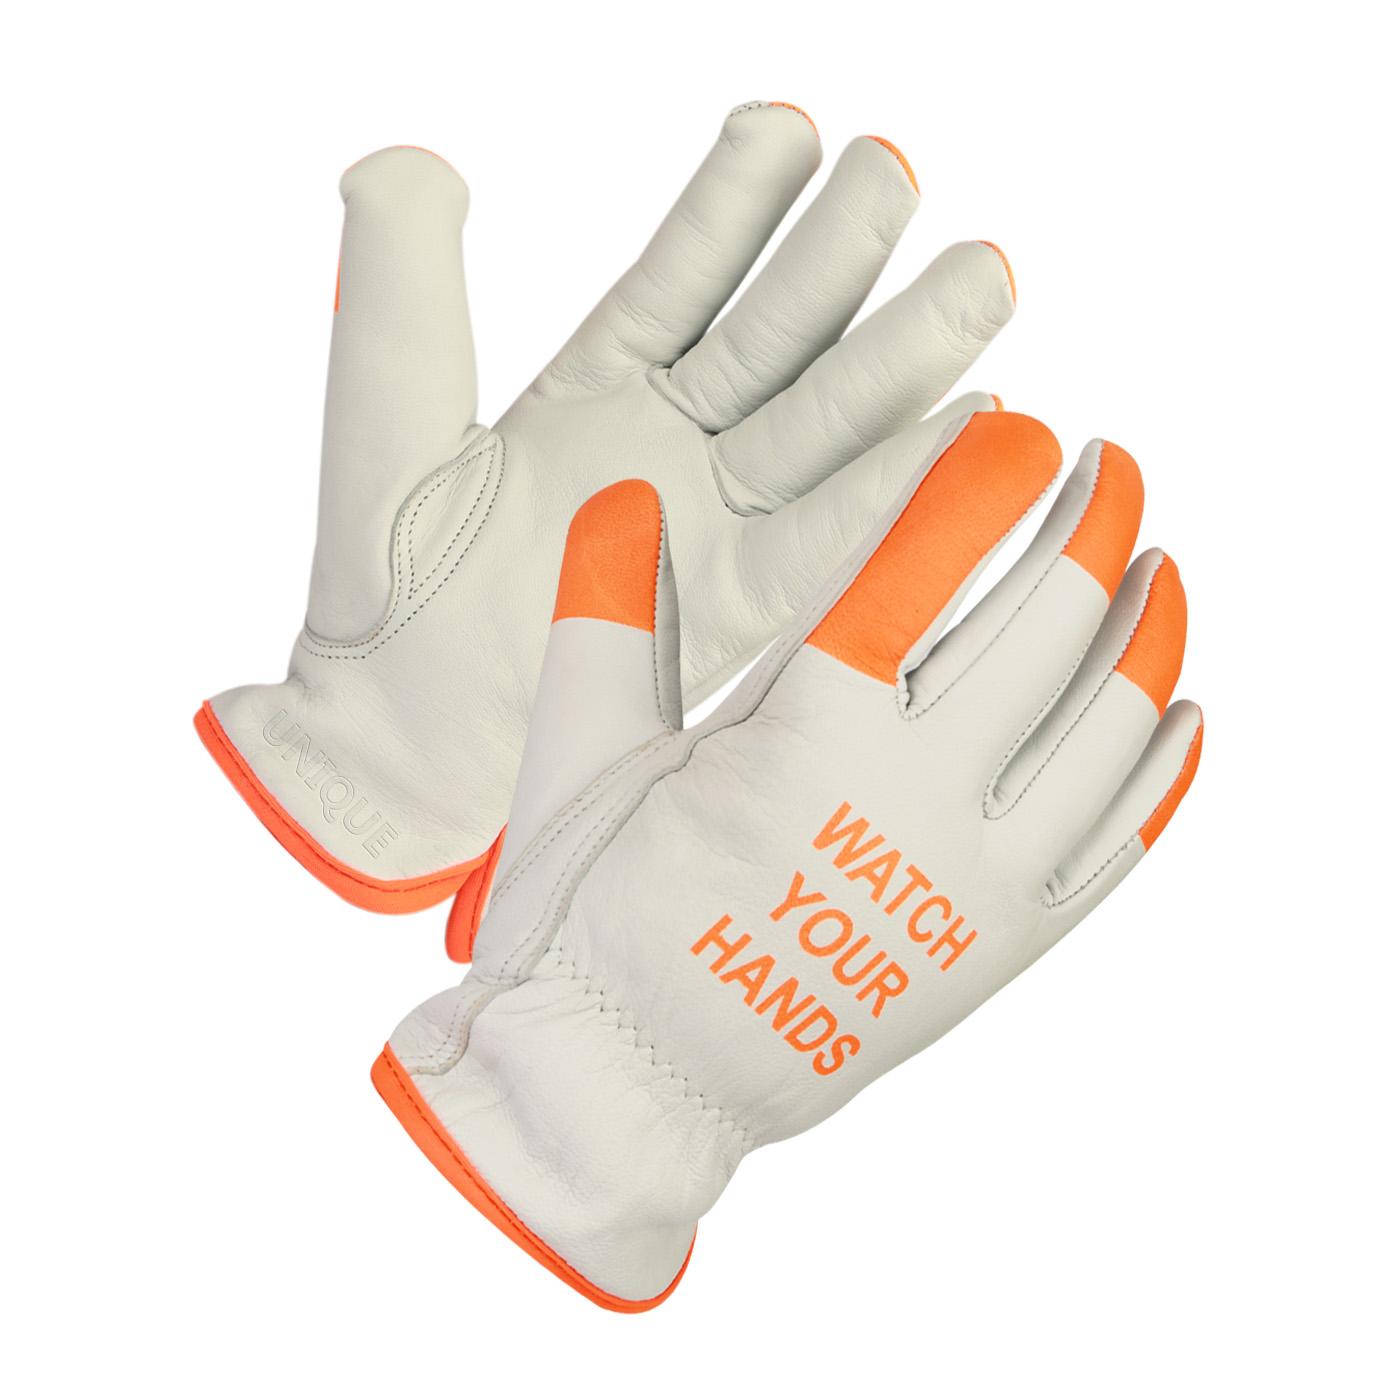 Goatskin Grain Driver Gloves Keystone Thumb